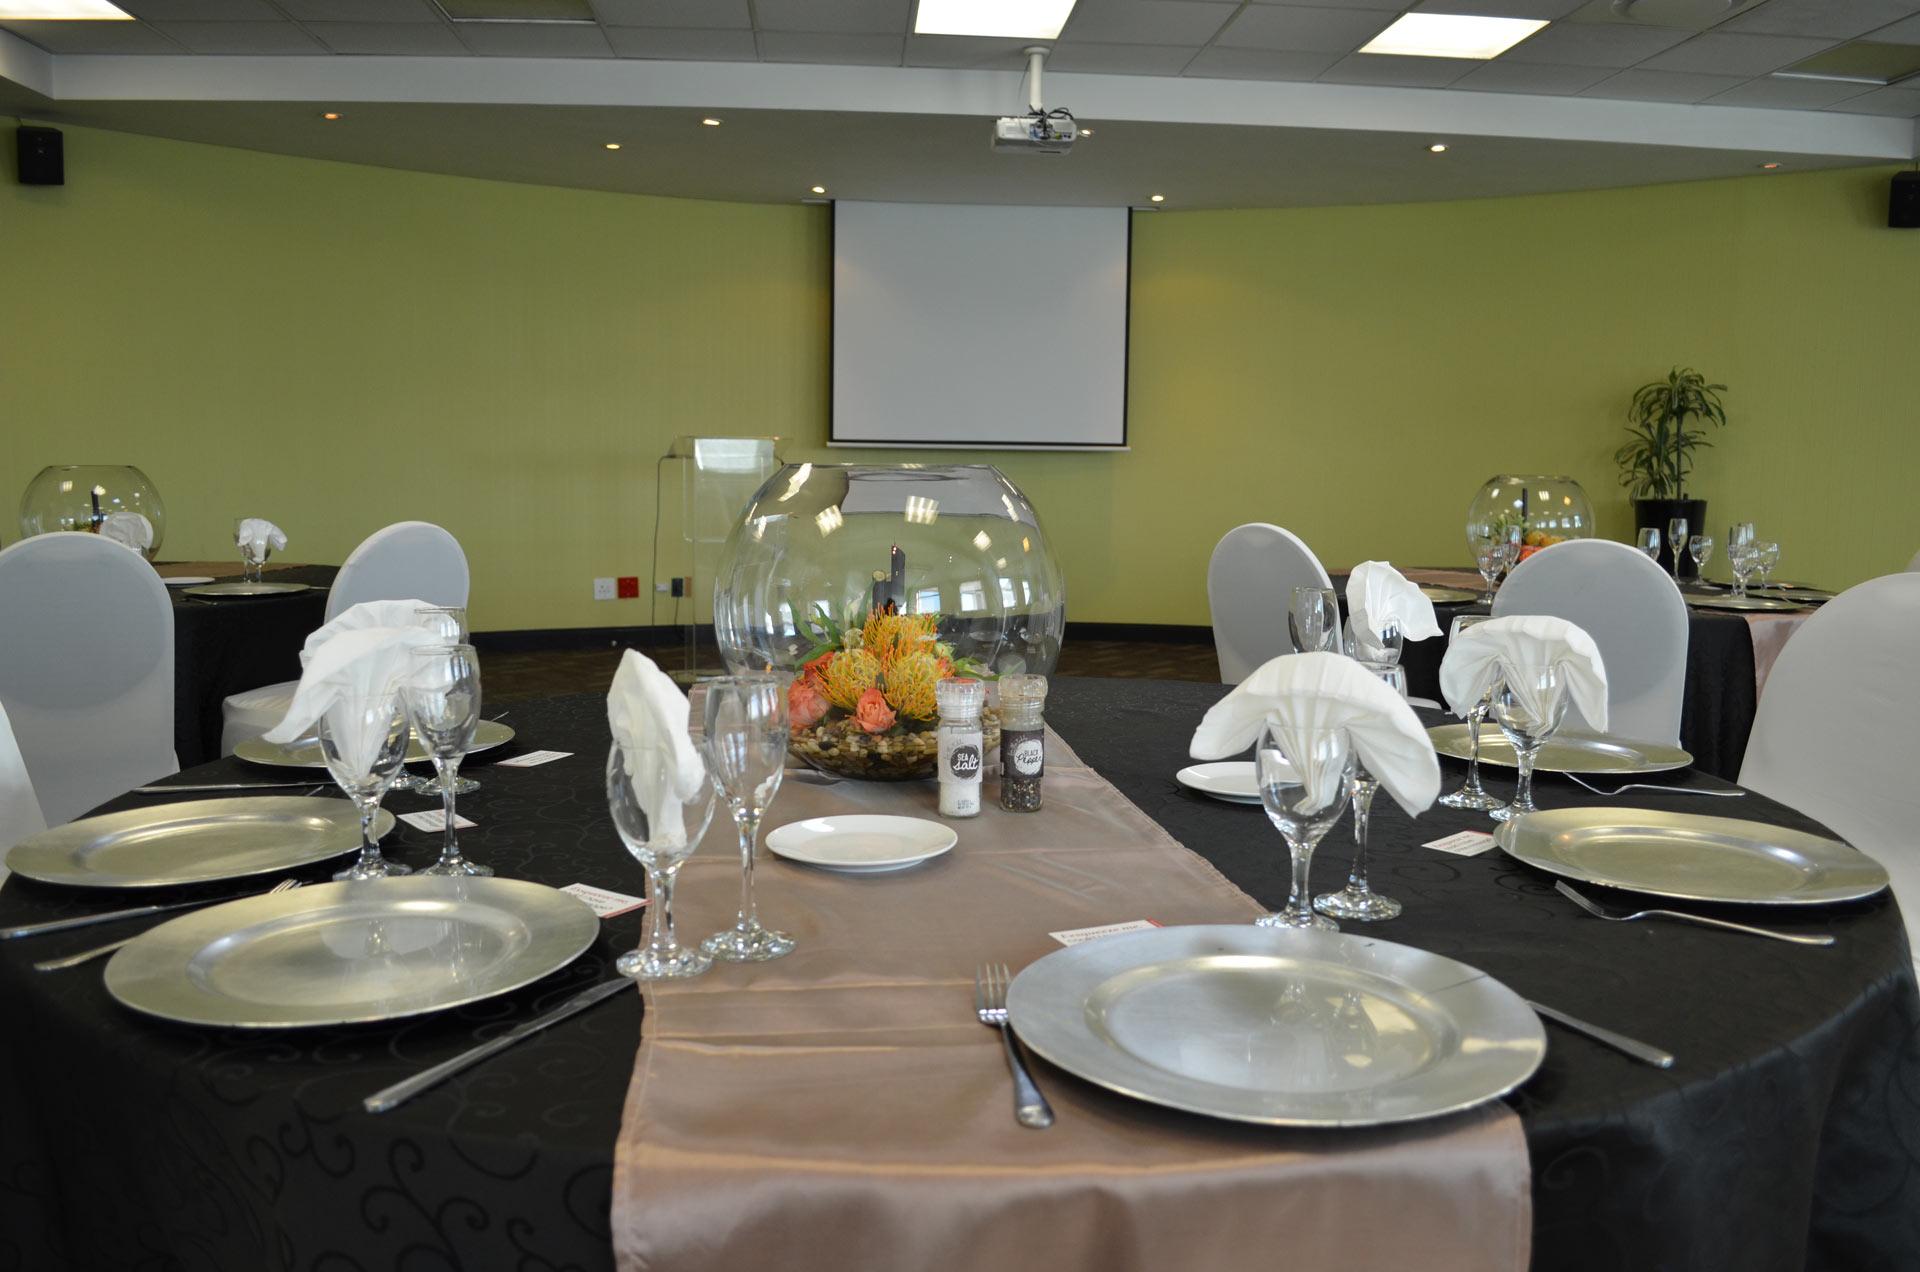 Jupiter - Skyline Views of Sandton   Focus Rooms Banquet Venue